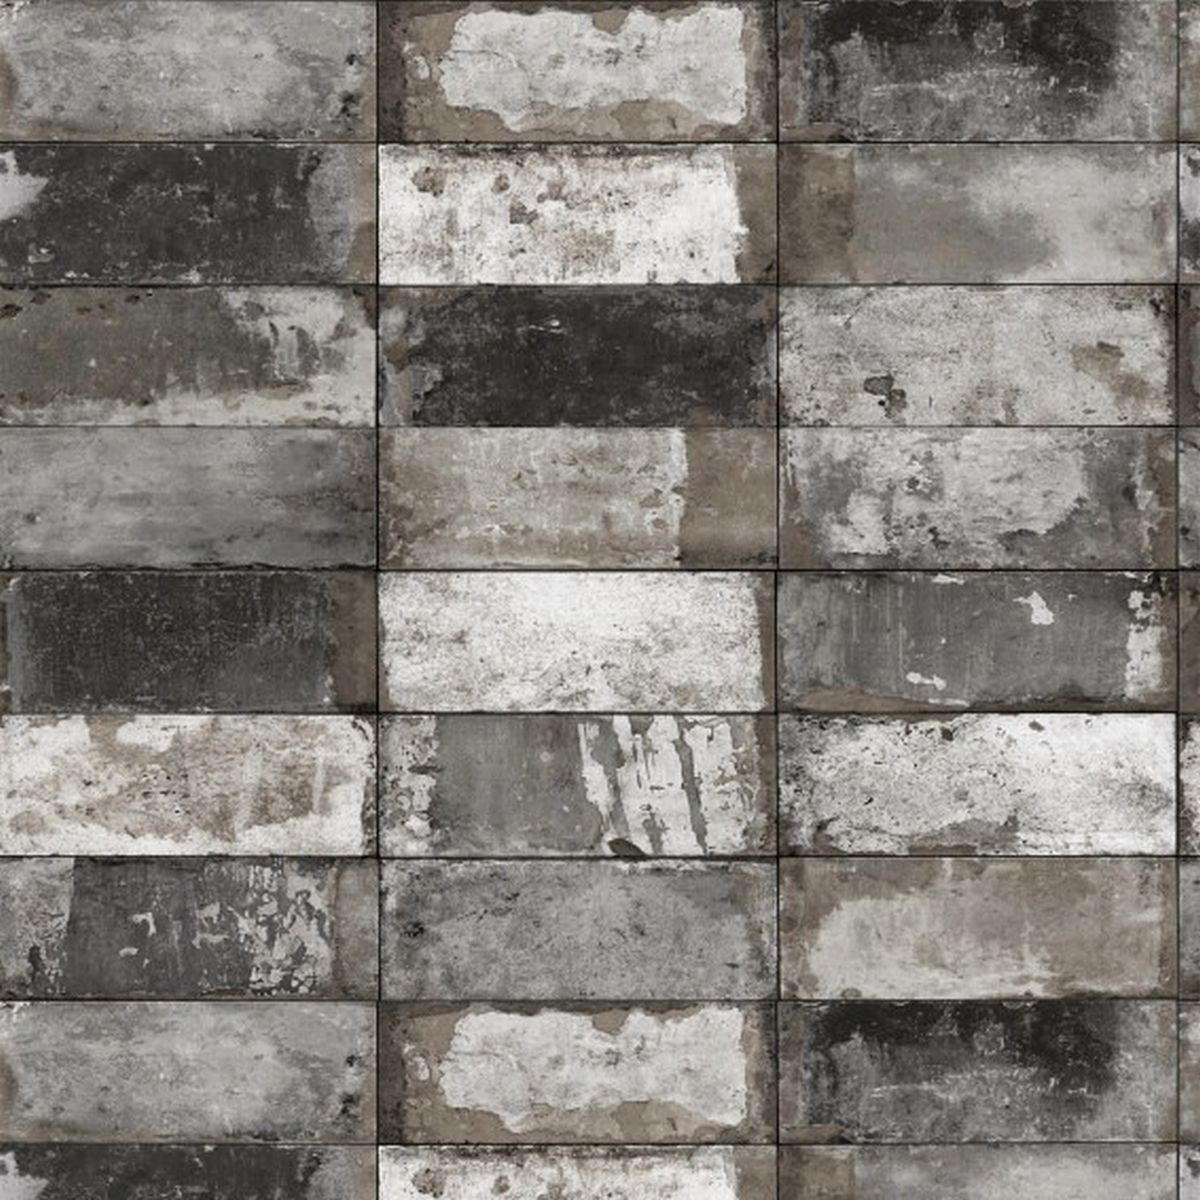 DesignID Vliestapete Luxuriöse Tapete NF232024 Grau Steintapete